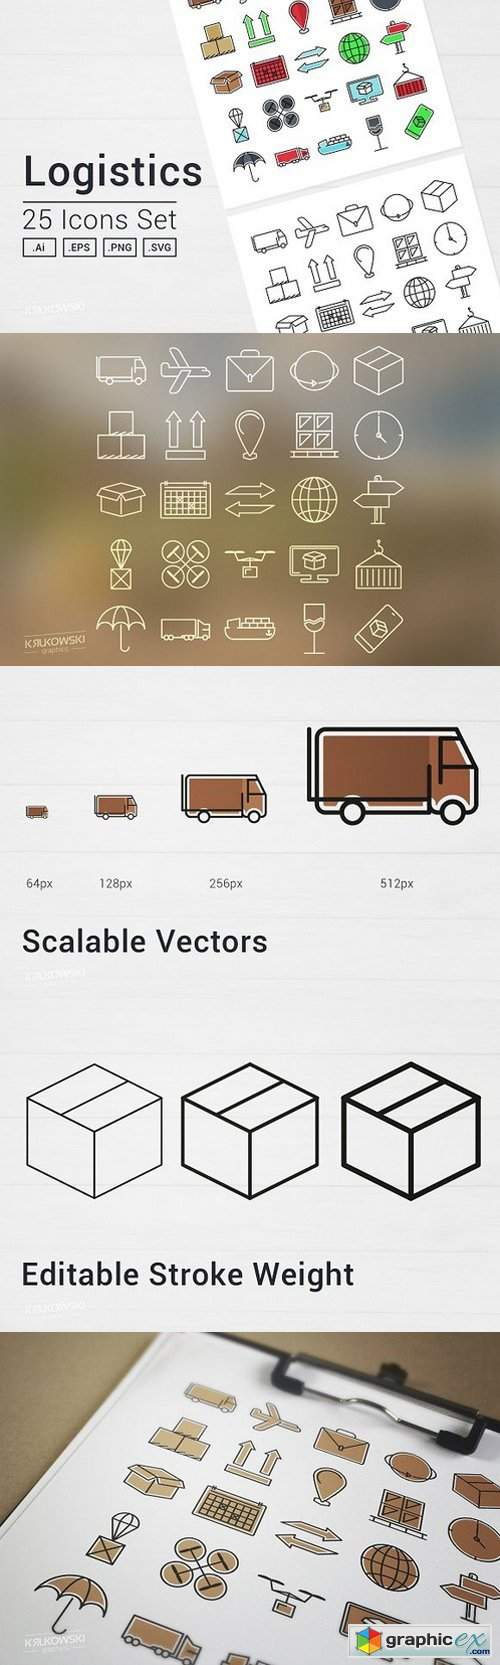 Logistics Icons Set 1367876